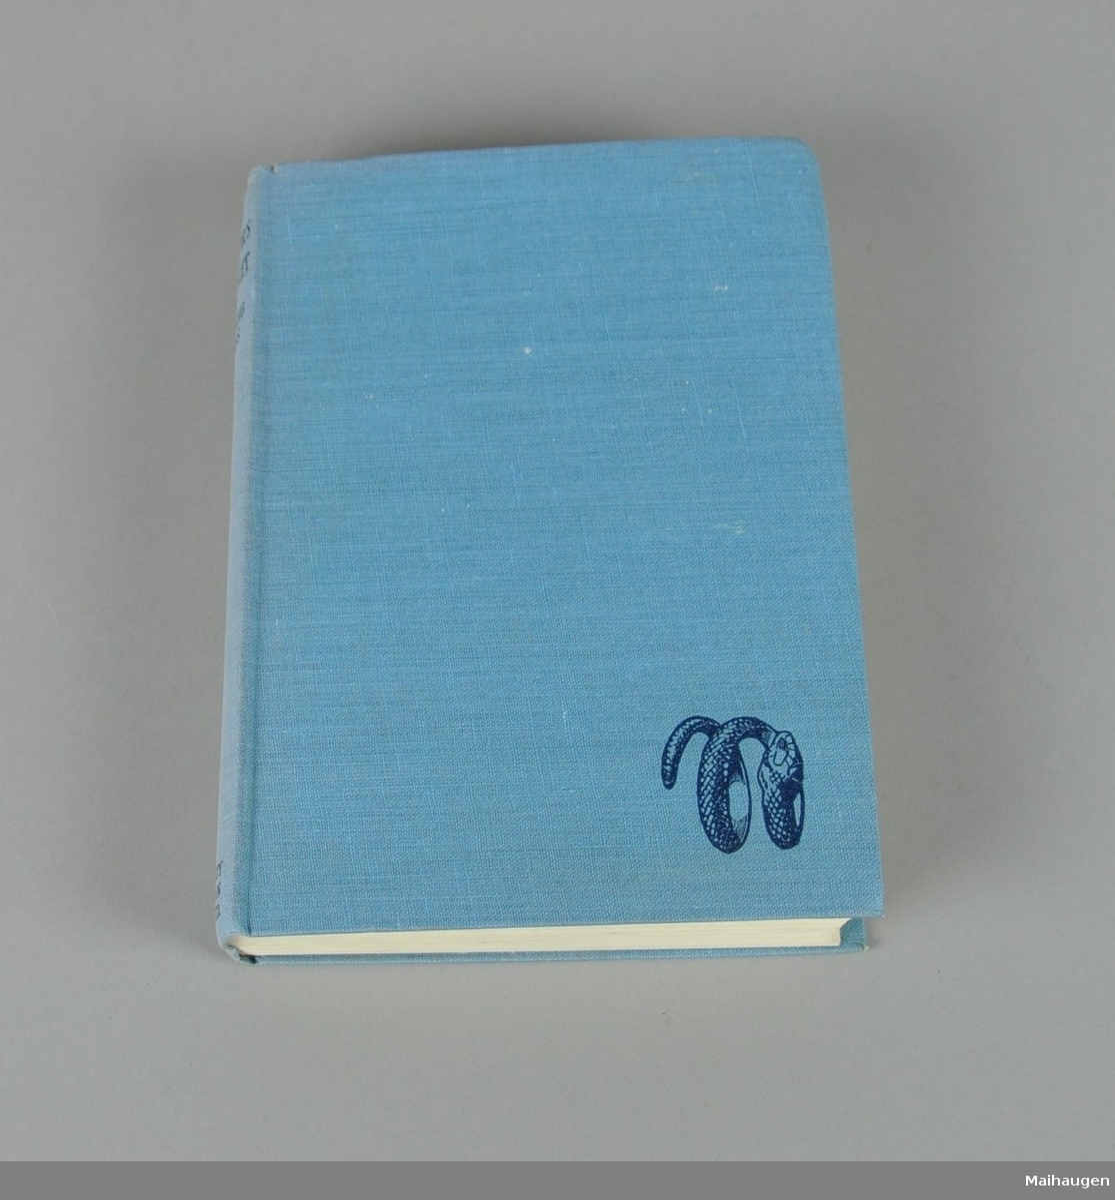 s. 234.